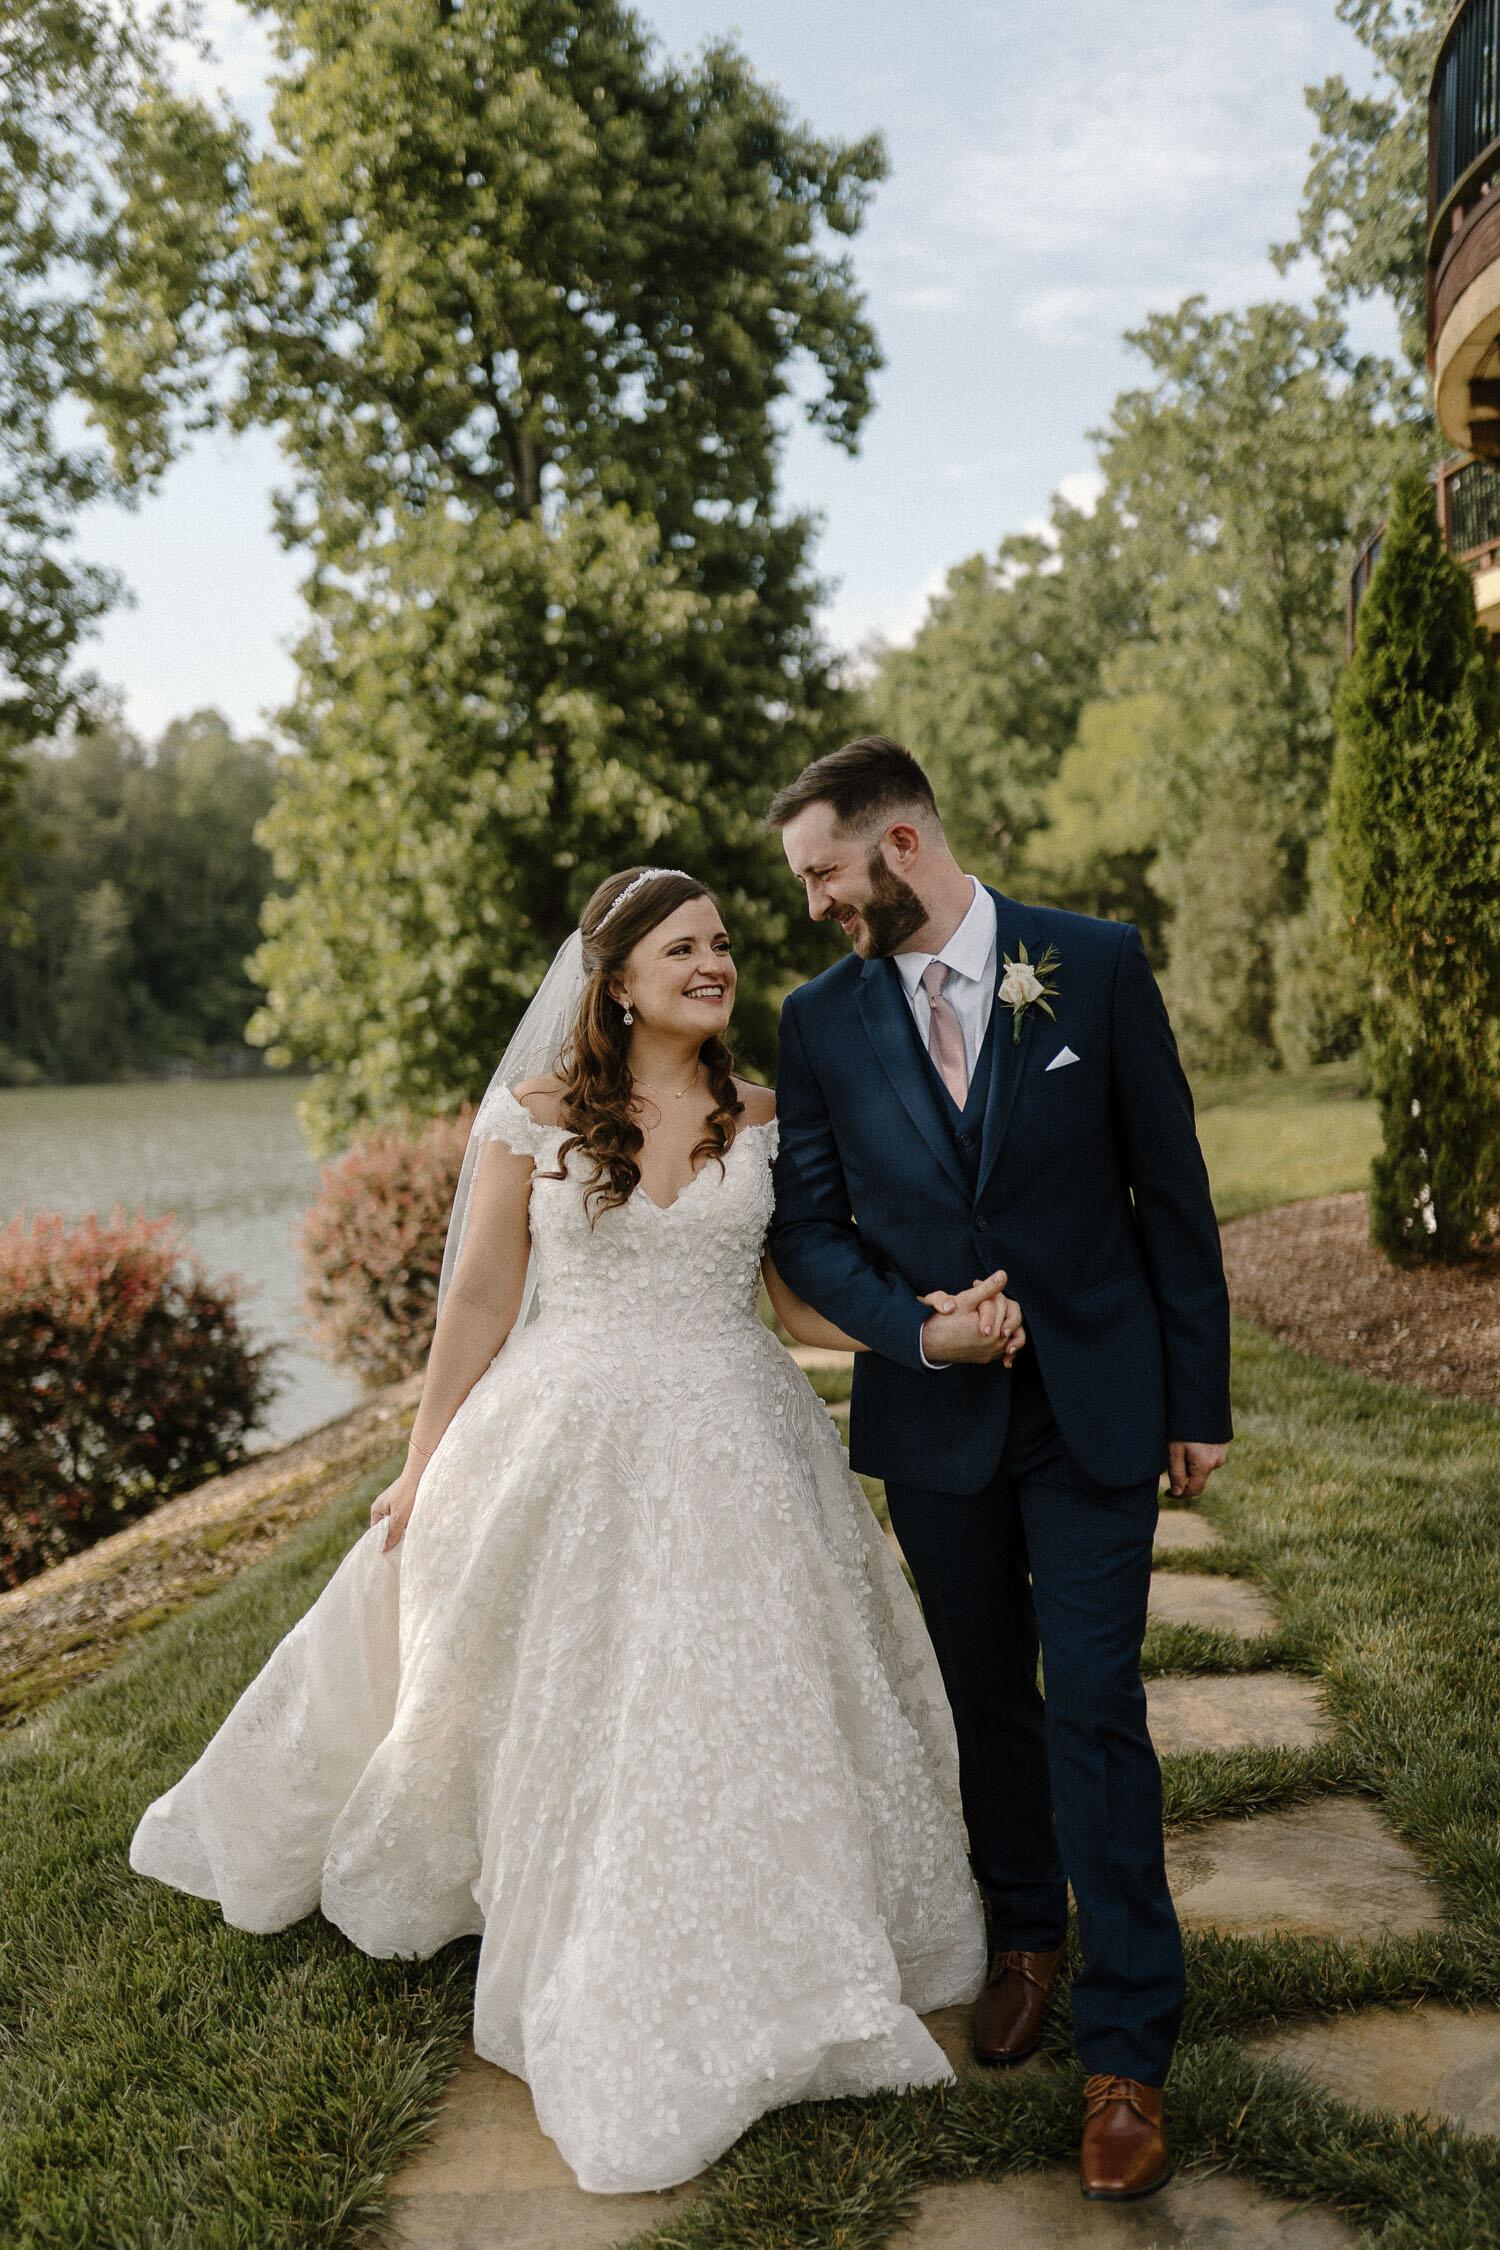 Greensboro Winston-Salem, NC Summer Wedding at Bella Collina by Kayli LaFon Photography | North Carolina based Intimate Wedding & Elopement Photographer